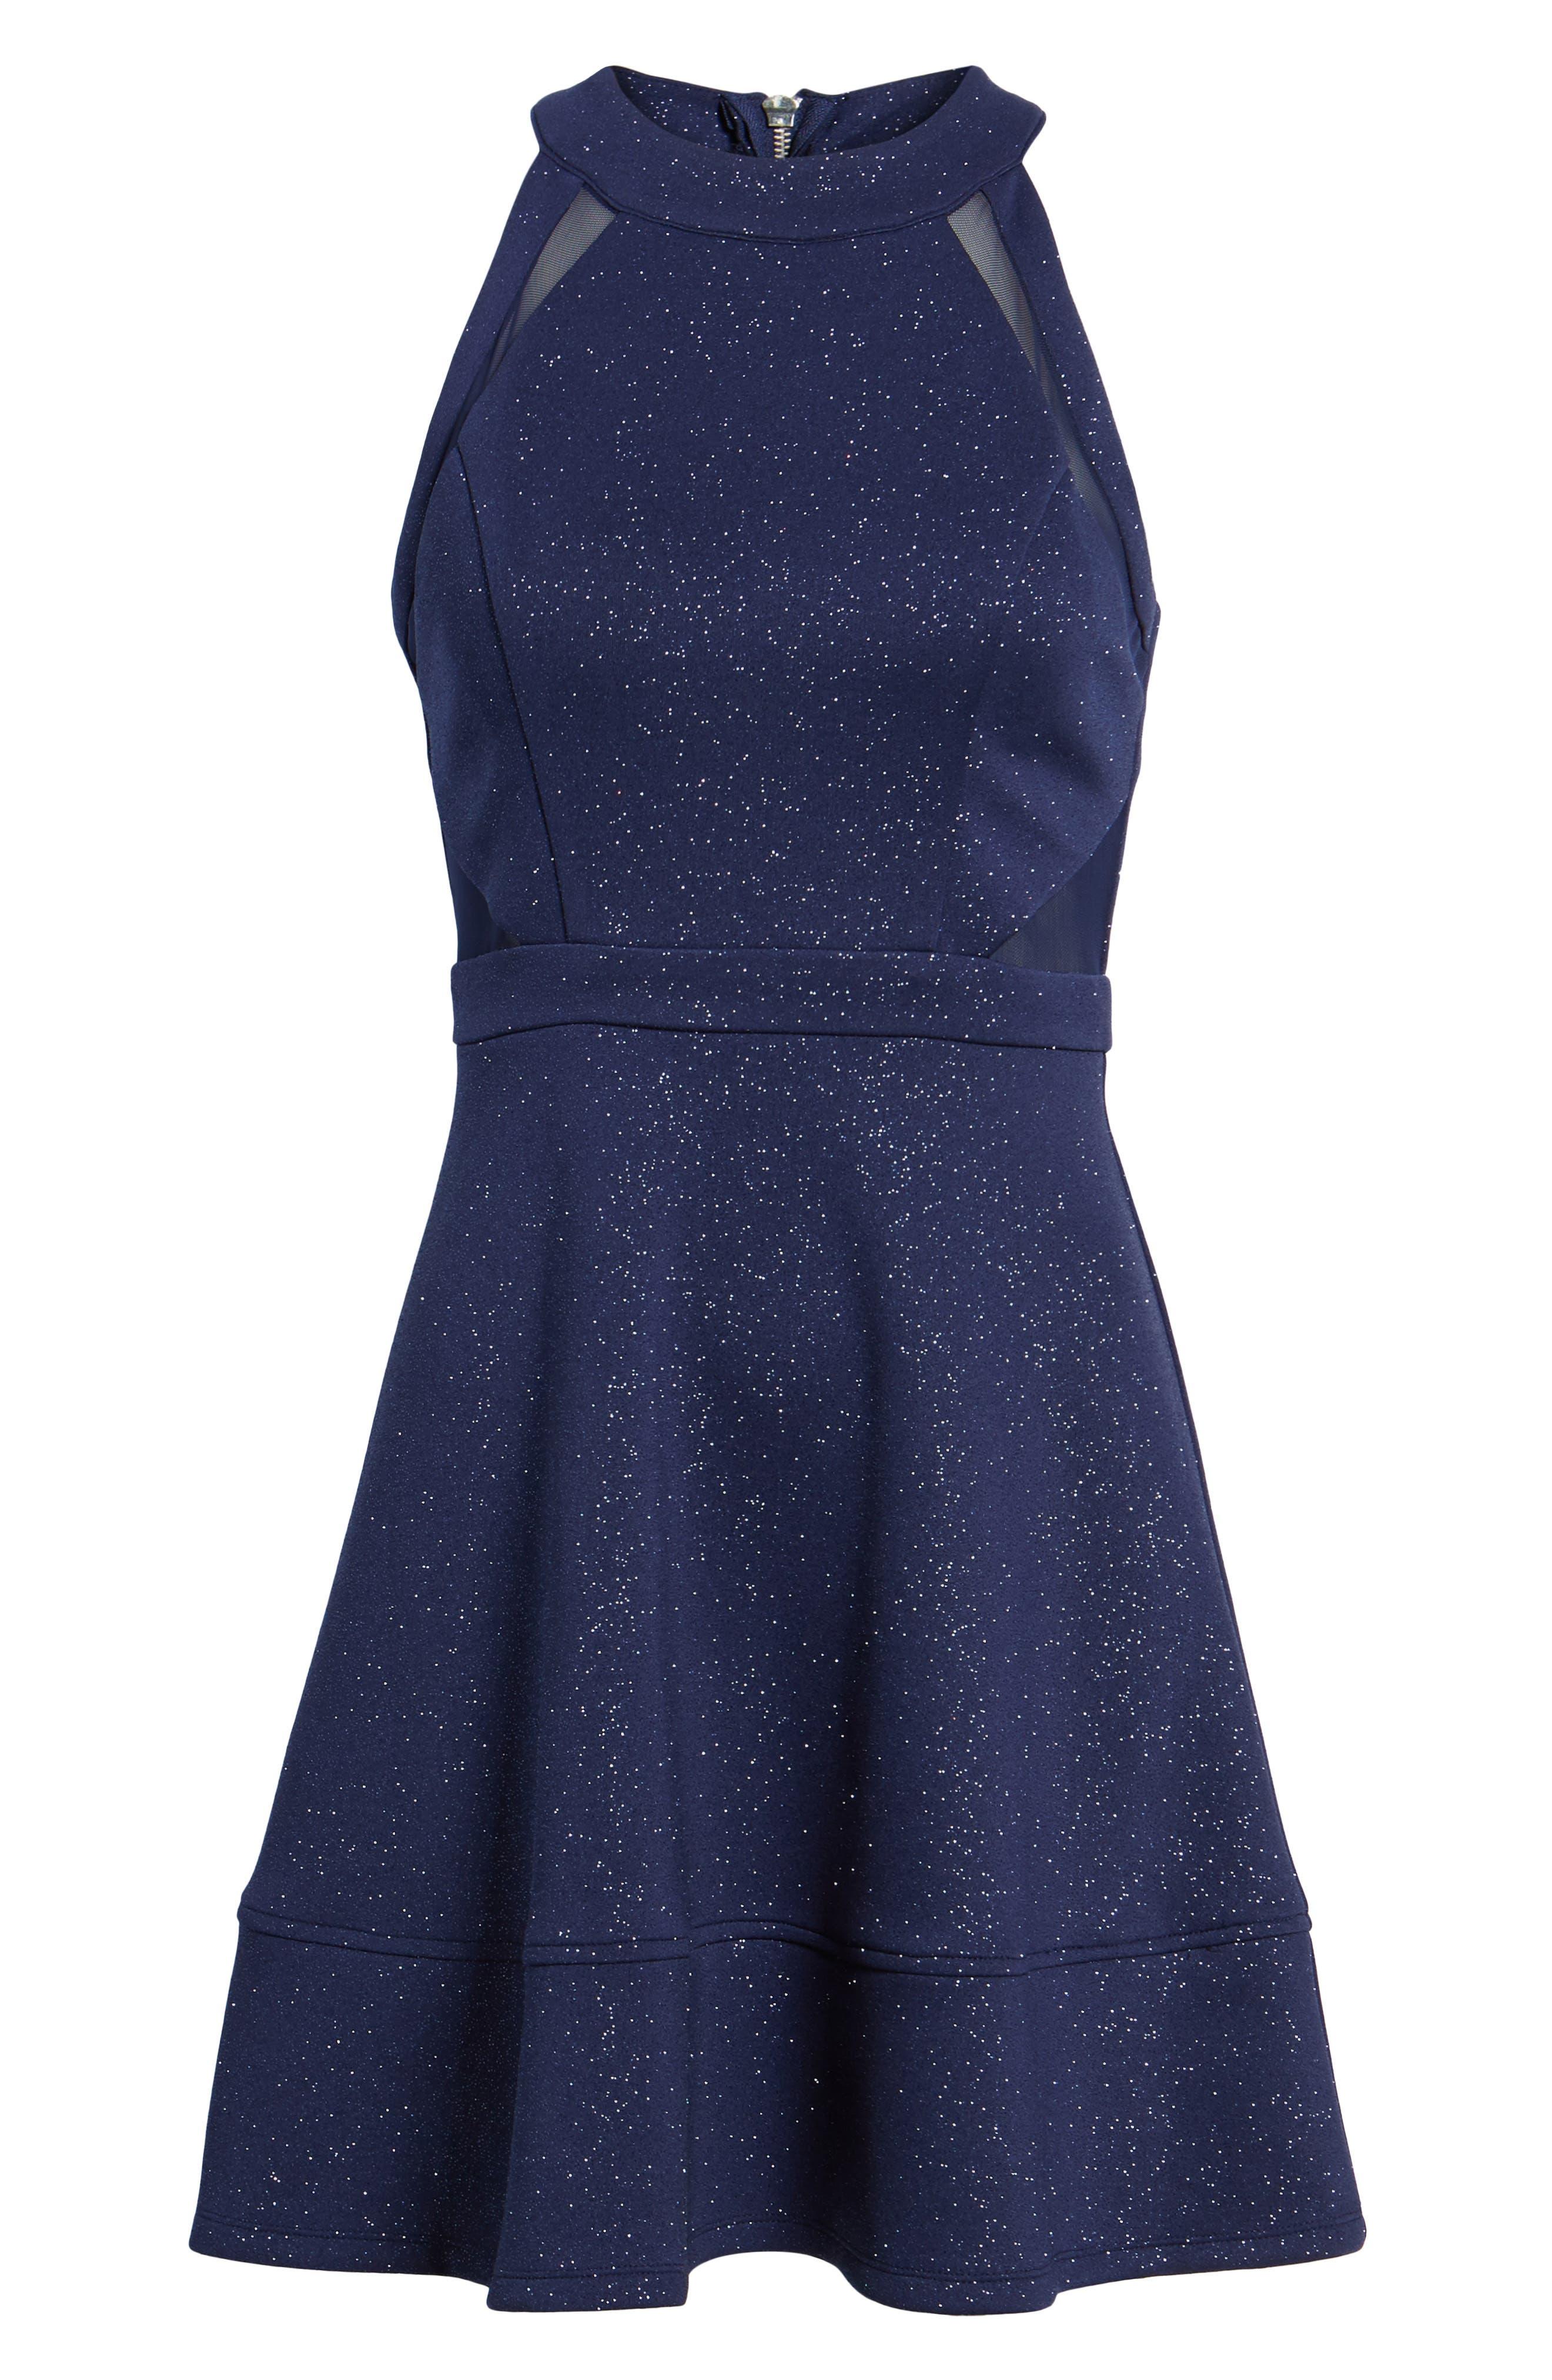 Illusion Glitter Skater Dress,                             Alternate thumbnail 6, color,                             400